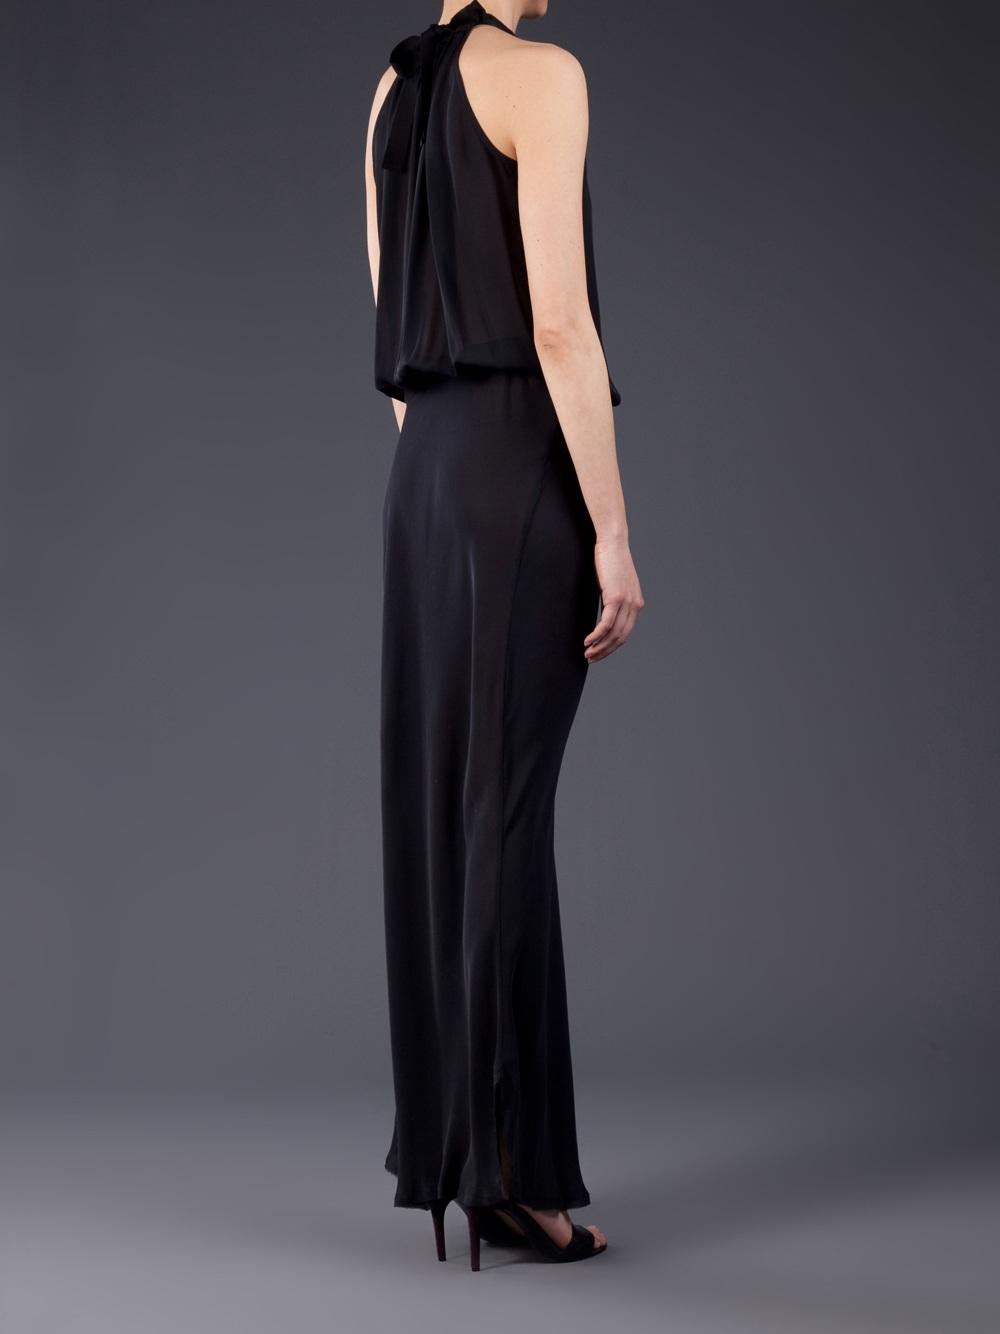 Lyst Nili Lotan Ribbon Tie Halter Dress In Black